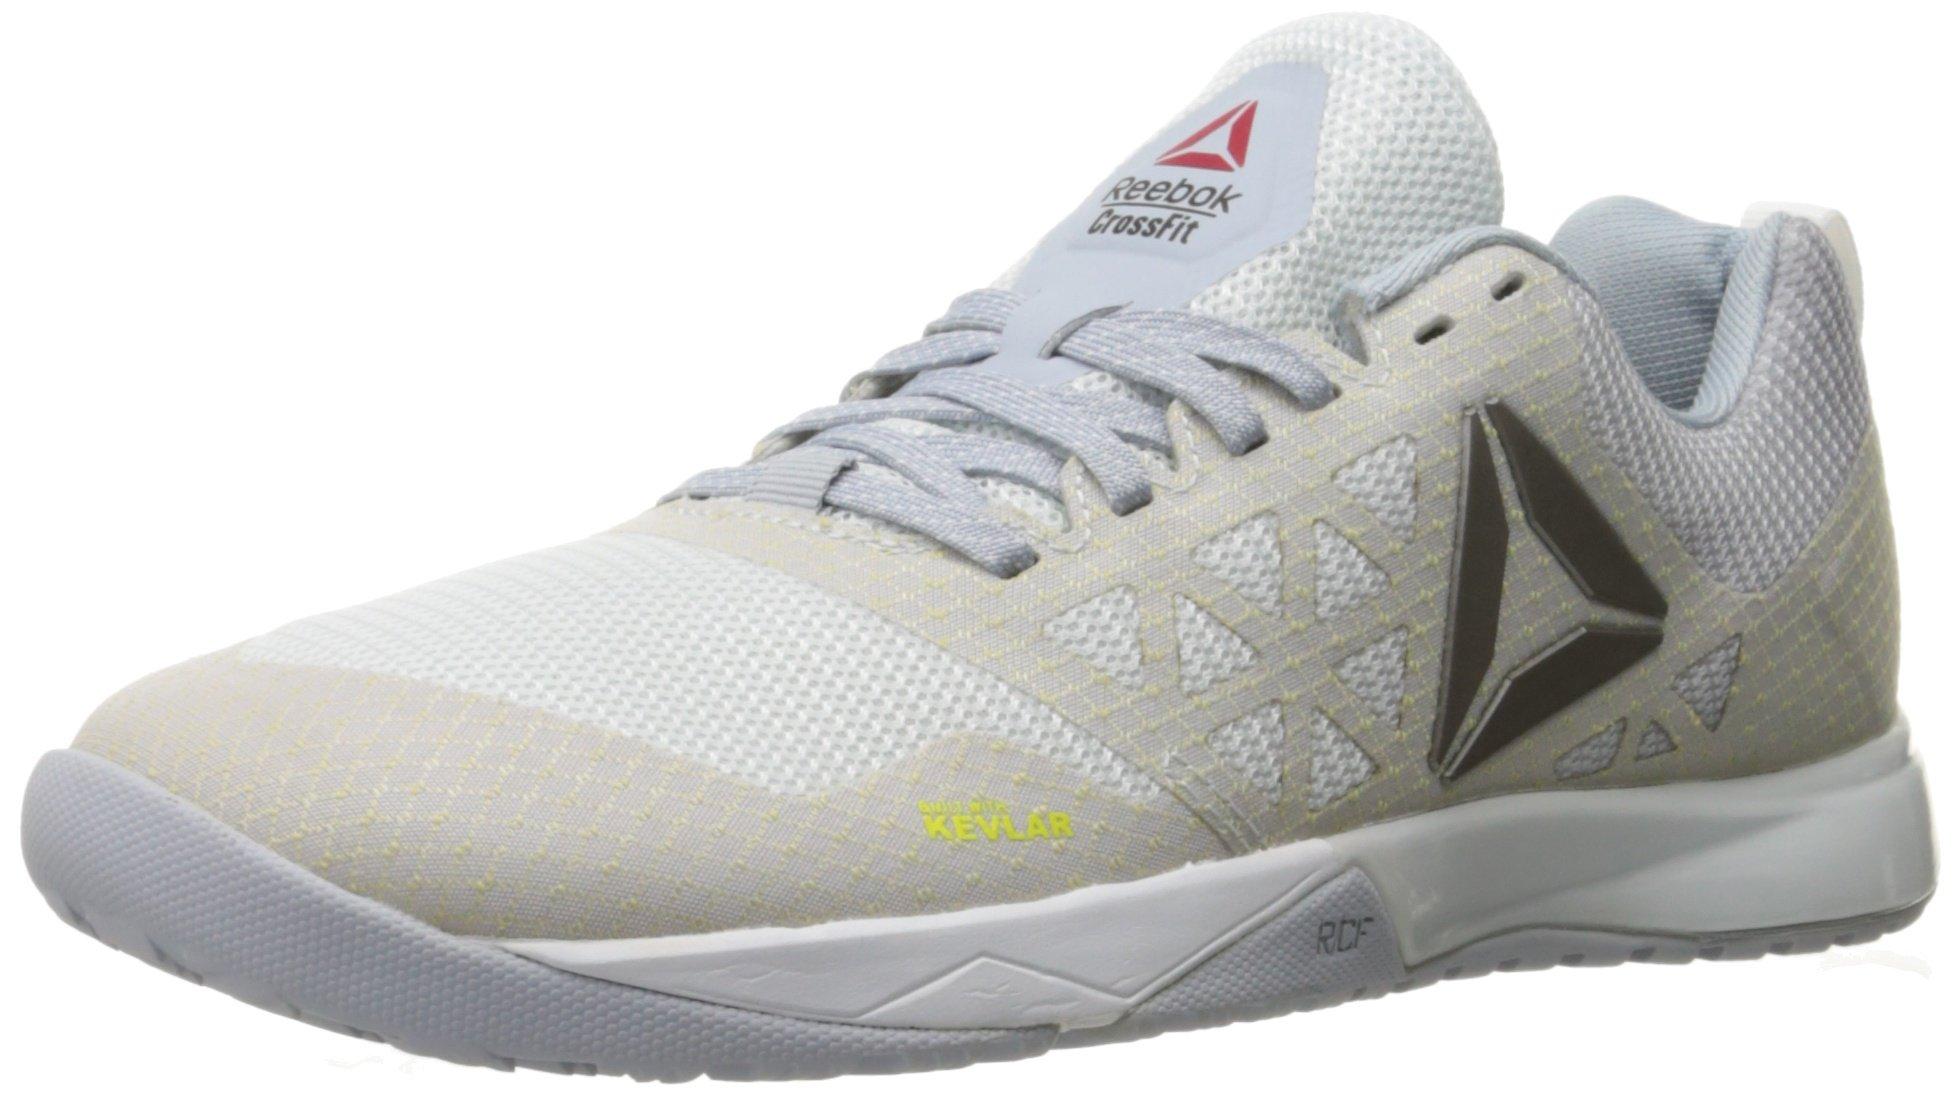 Reebok Women's Crossfit Nano 6-0 Cross-Trainer Shoe, Polar Blue/Cloud Grey/White/Black/Pewter, 11 M US